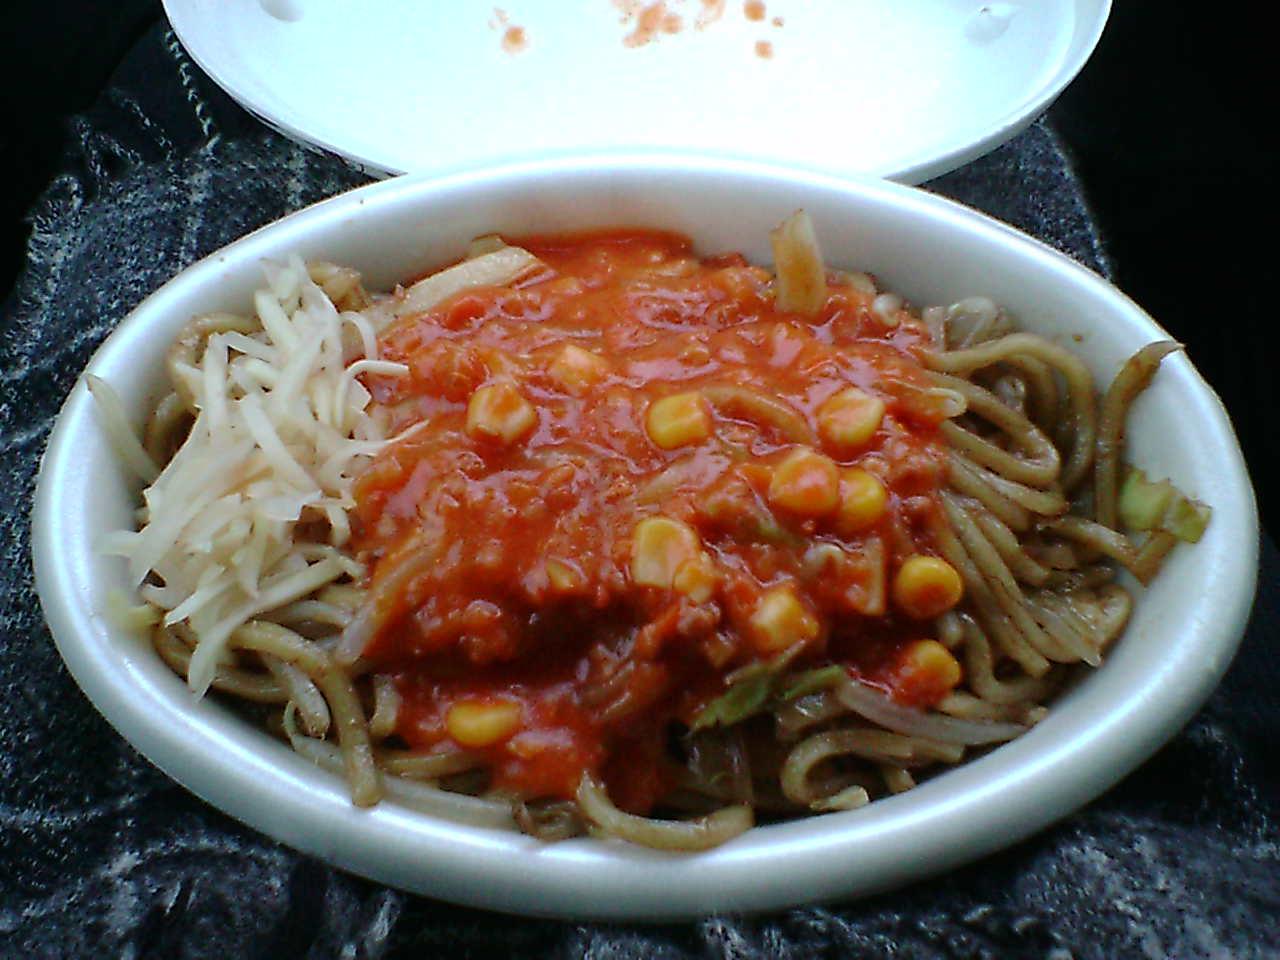 https://upload.wikimedia.org/wikipedia/commons/5/5b/Italian%282%29_%28Mikazuki%29%2C_Japanese_local_fast_food.jpg